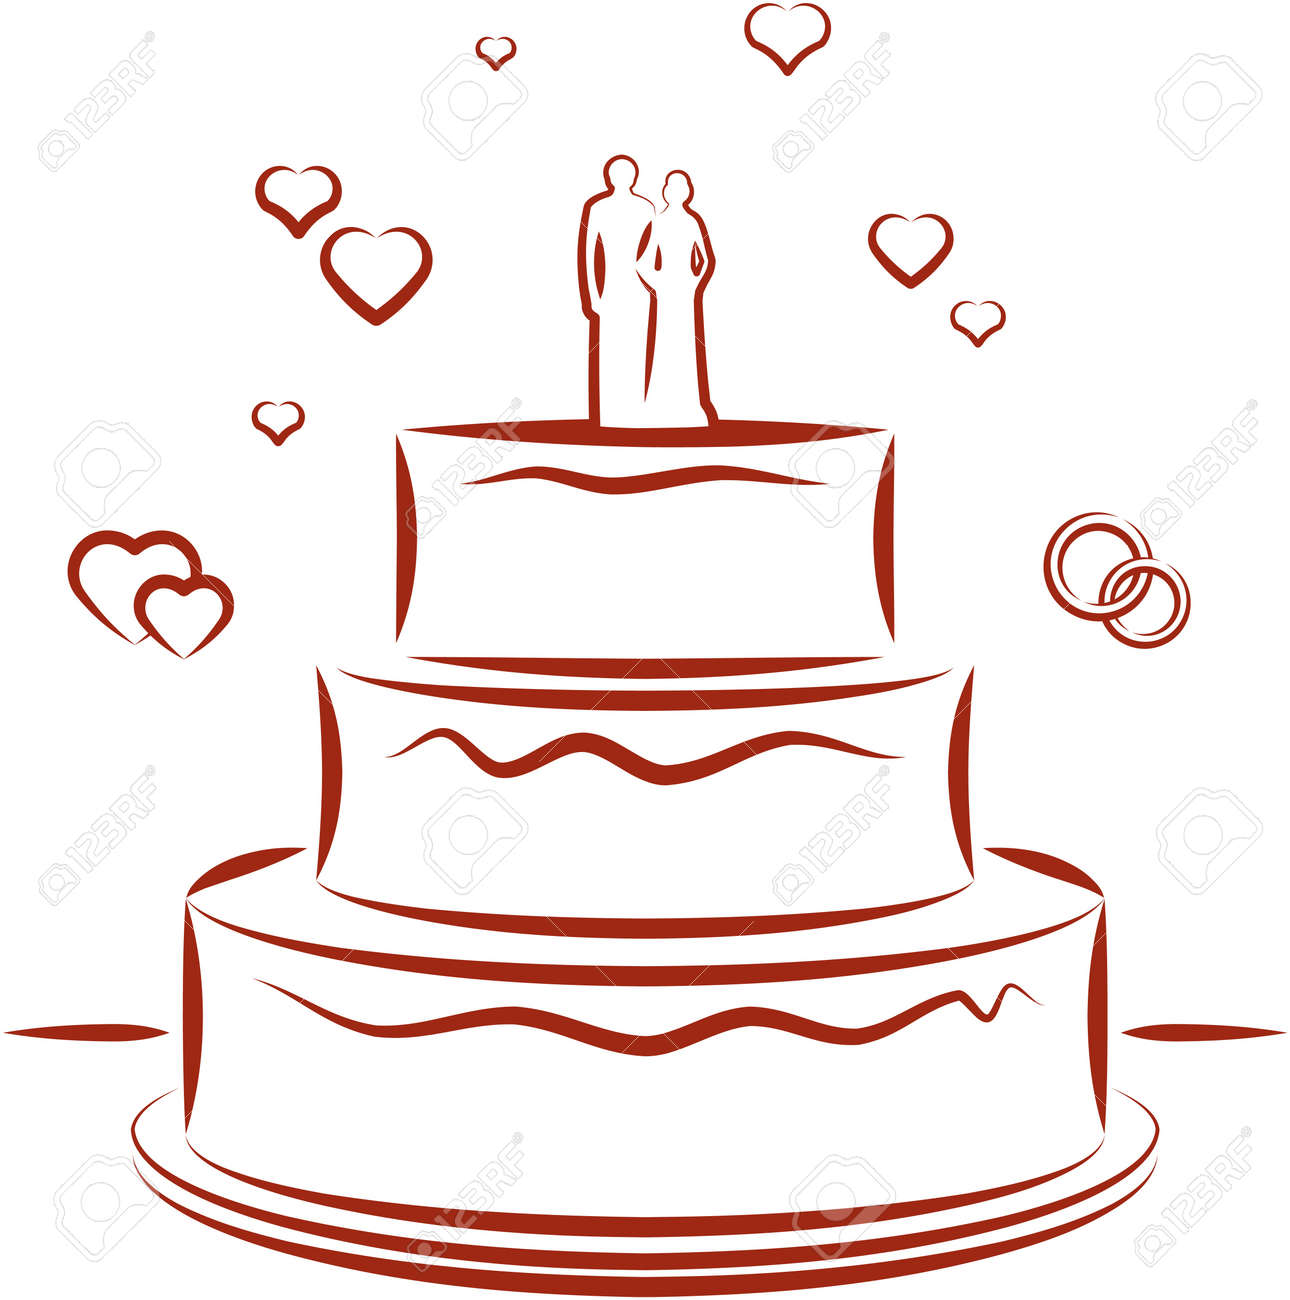 Wedding Cake Vector Illustration Royalty Free Cliparts Vectors